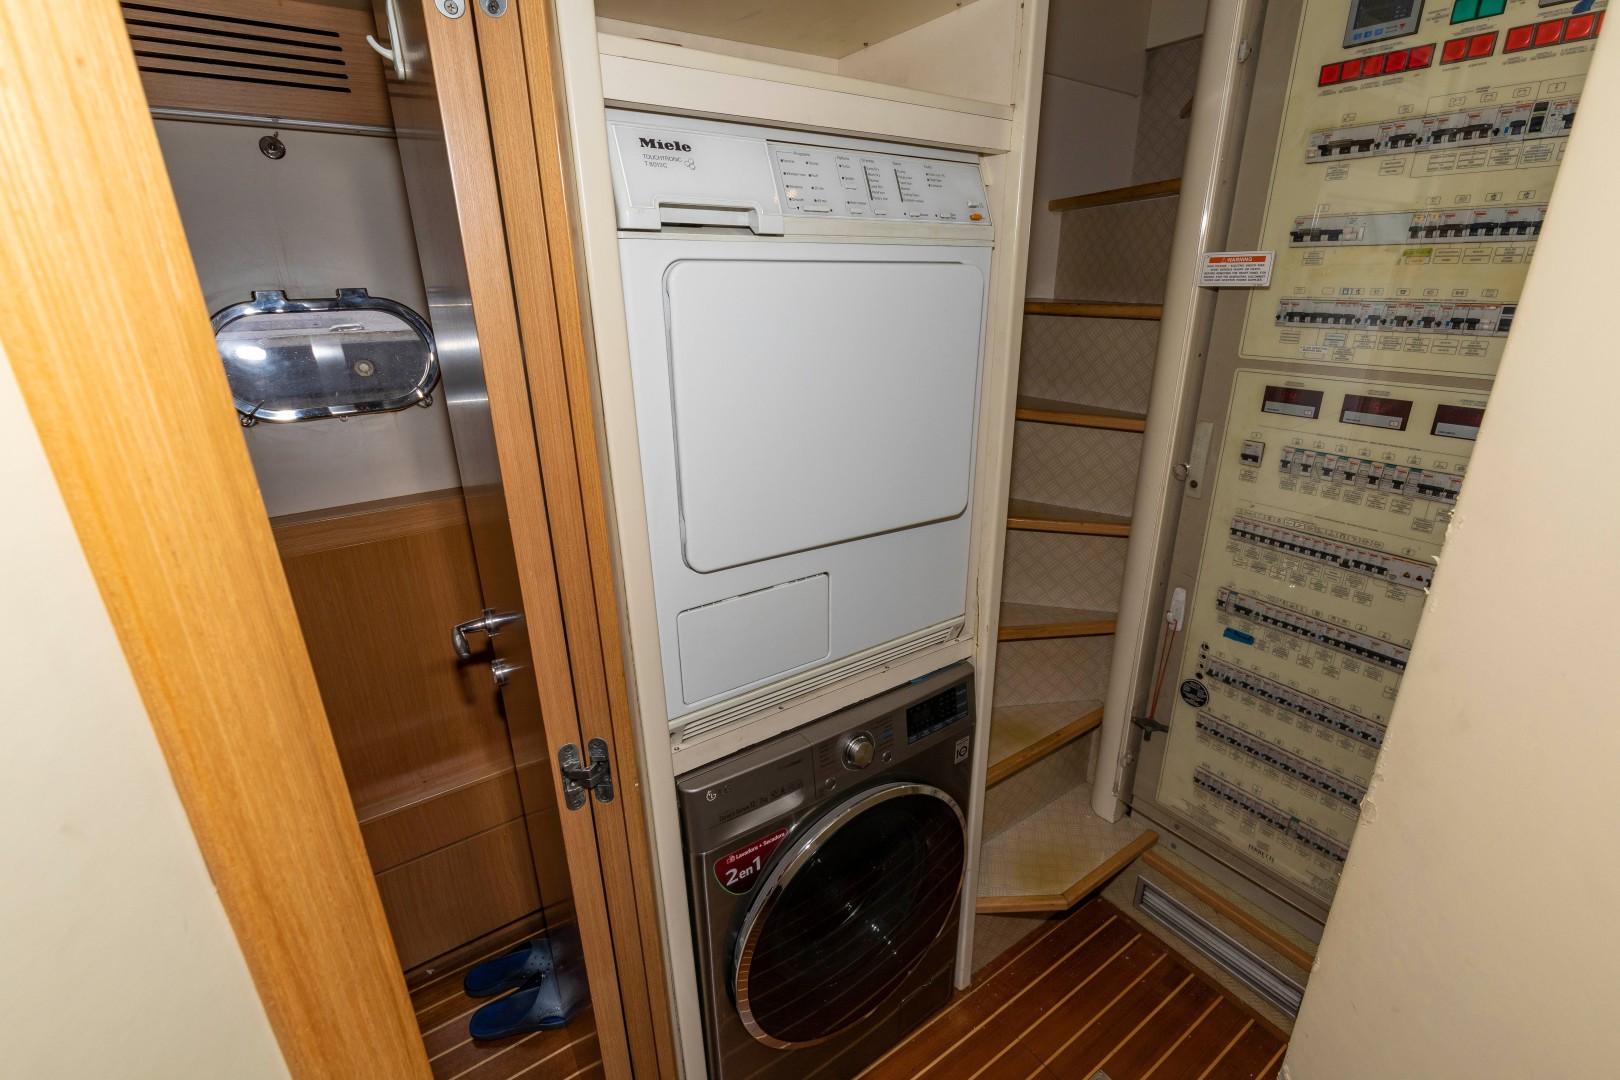 Ferretti 83 - MI RX - Washer/Dryer Combo